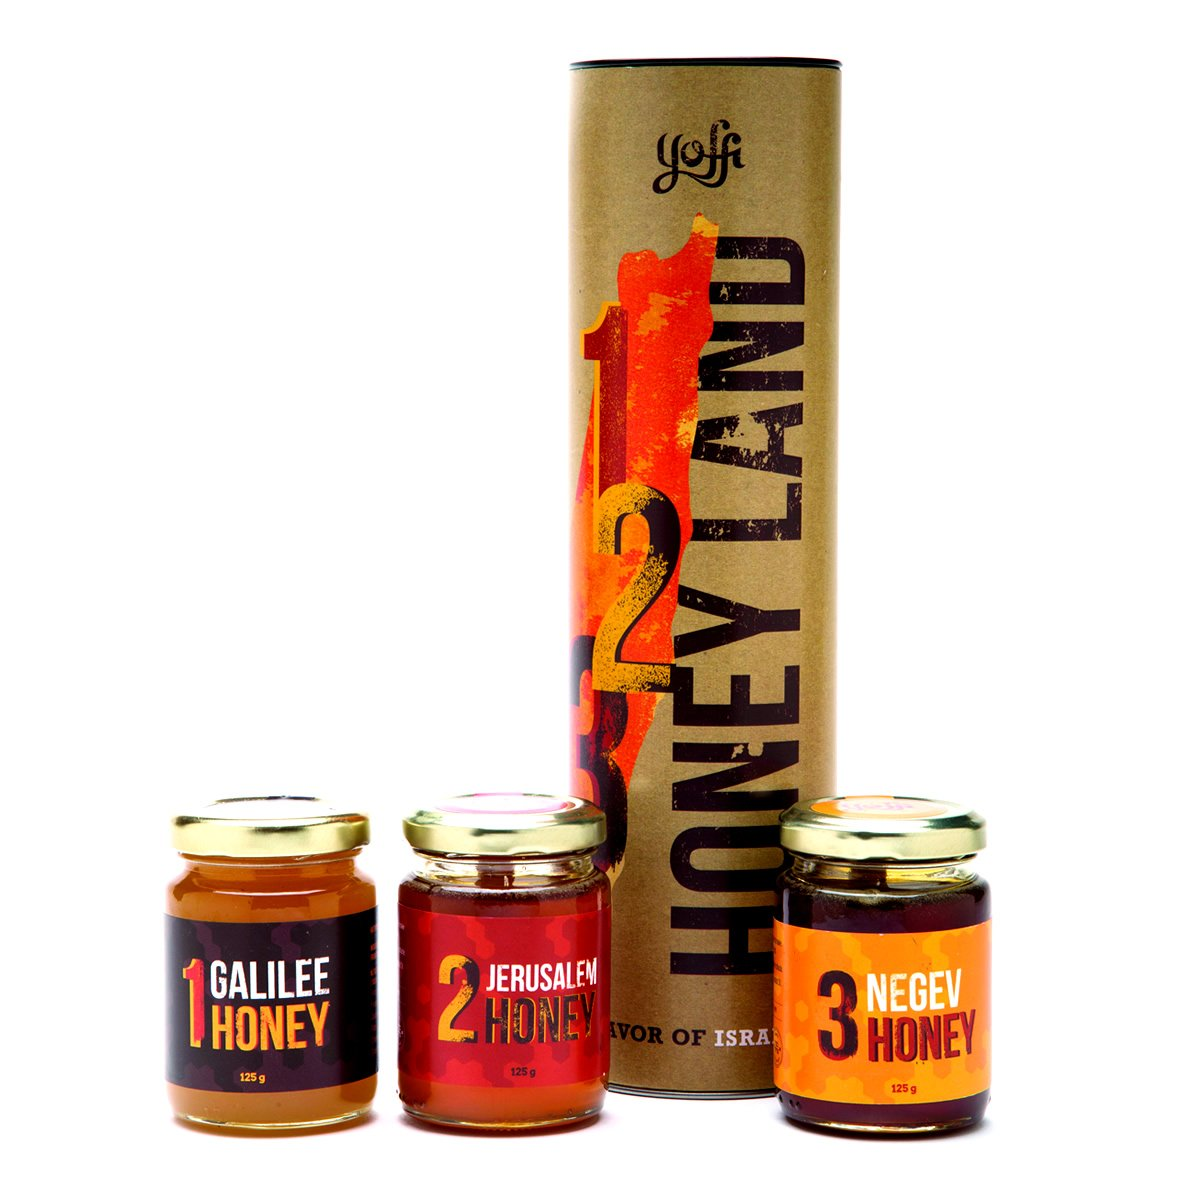 Yoffi Honeyland Set JEWISH GIFT Israeli Honey 3 Types Jerusalem Galelee and Negev 4.2 Ounce Each